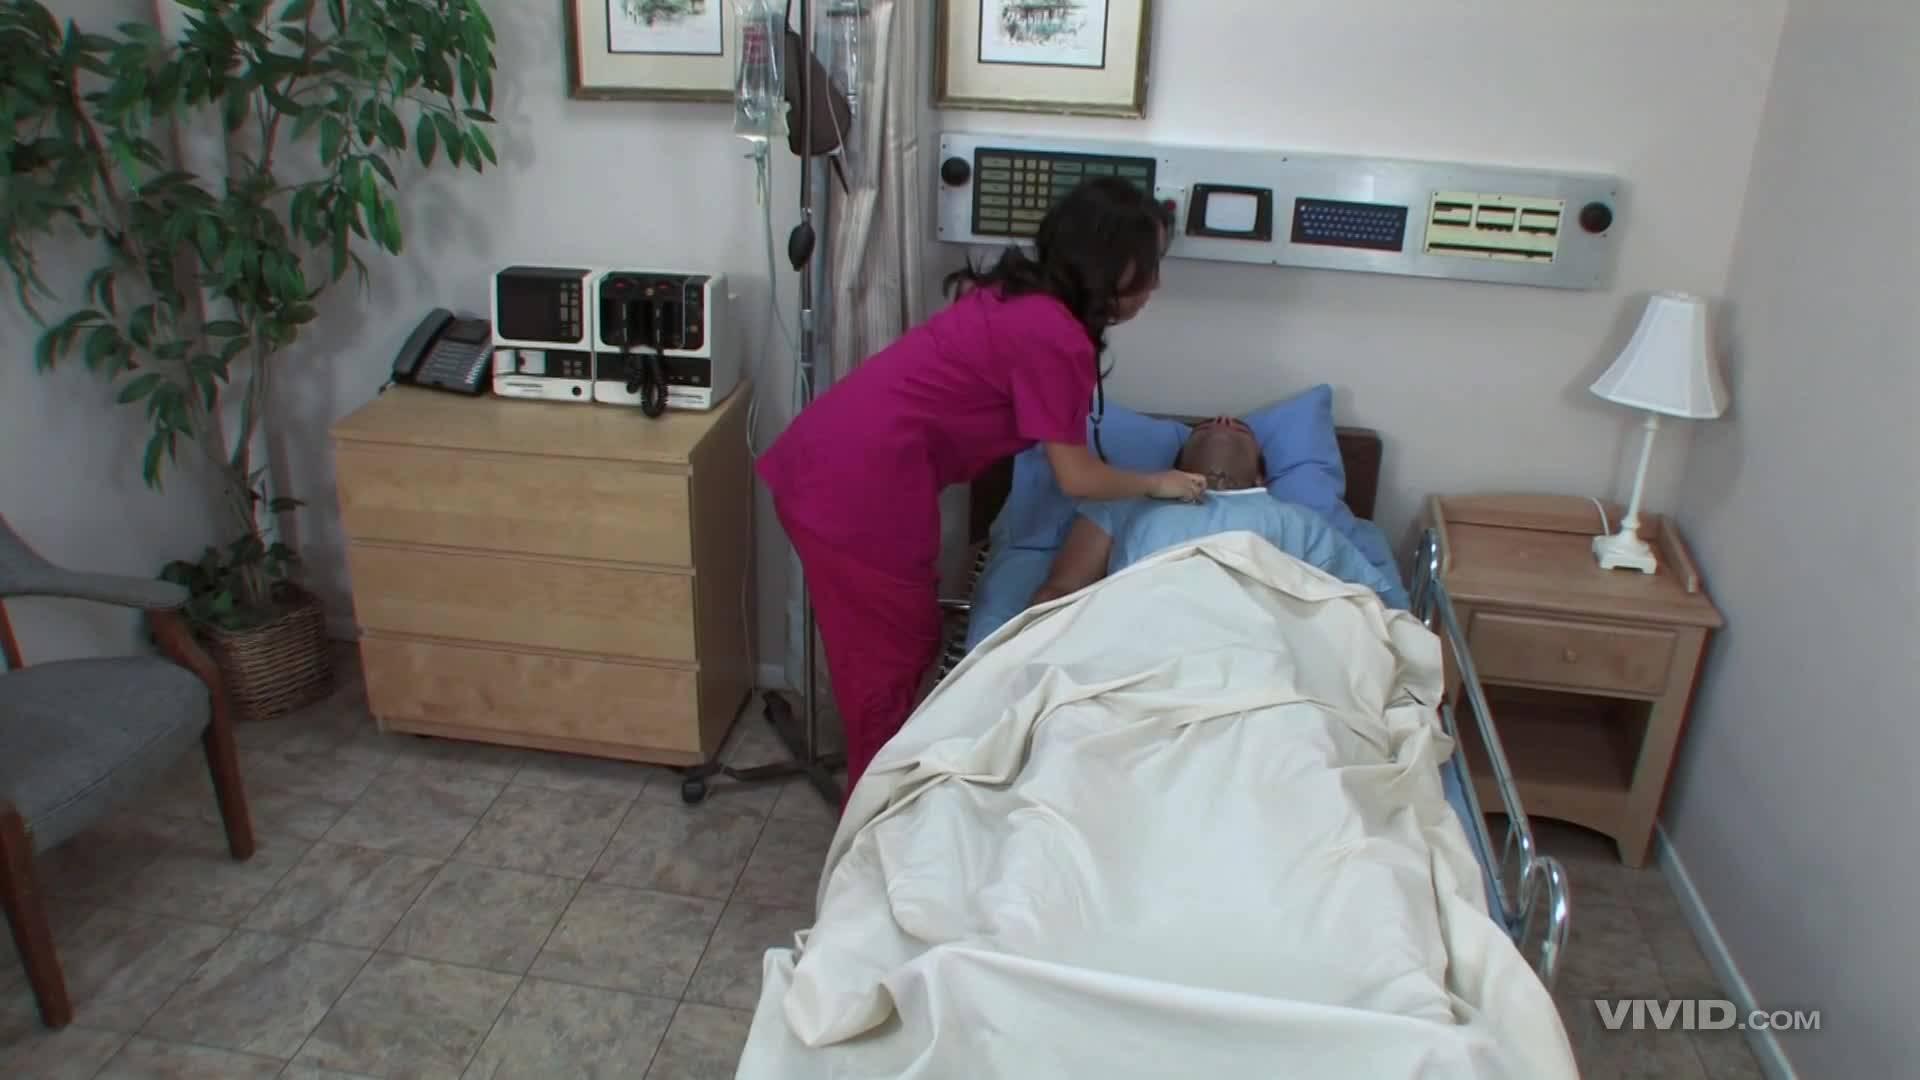 Восточная медсестричка забралась в койку пациента